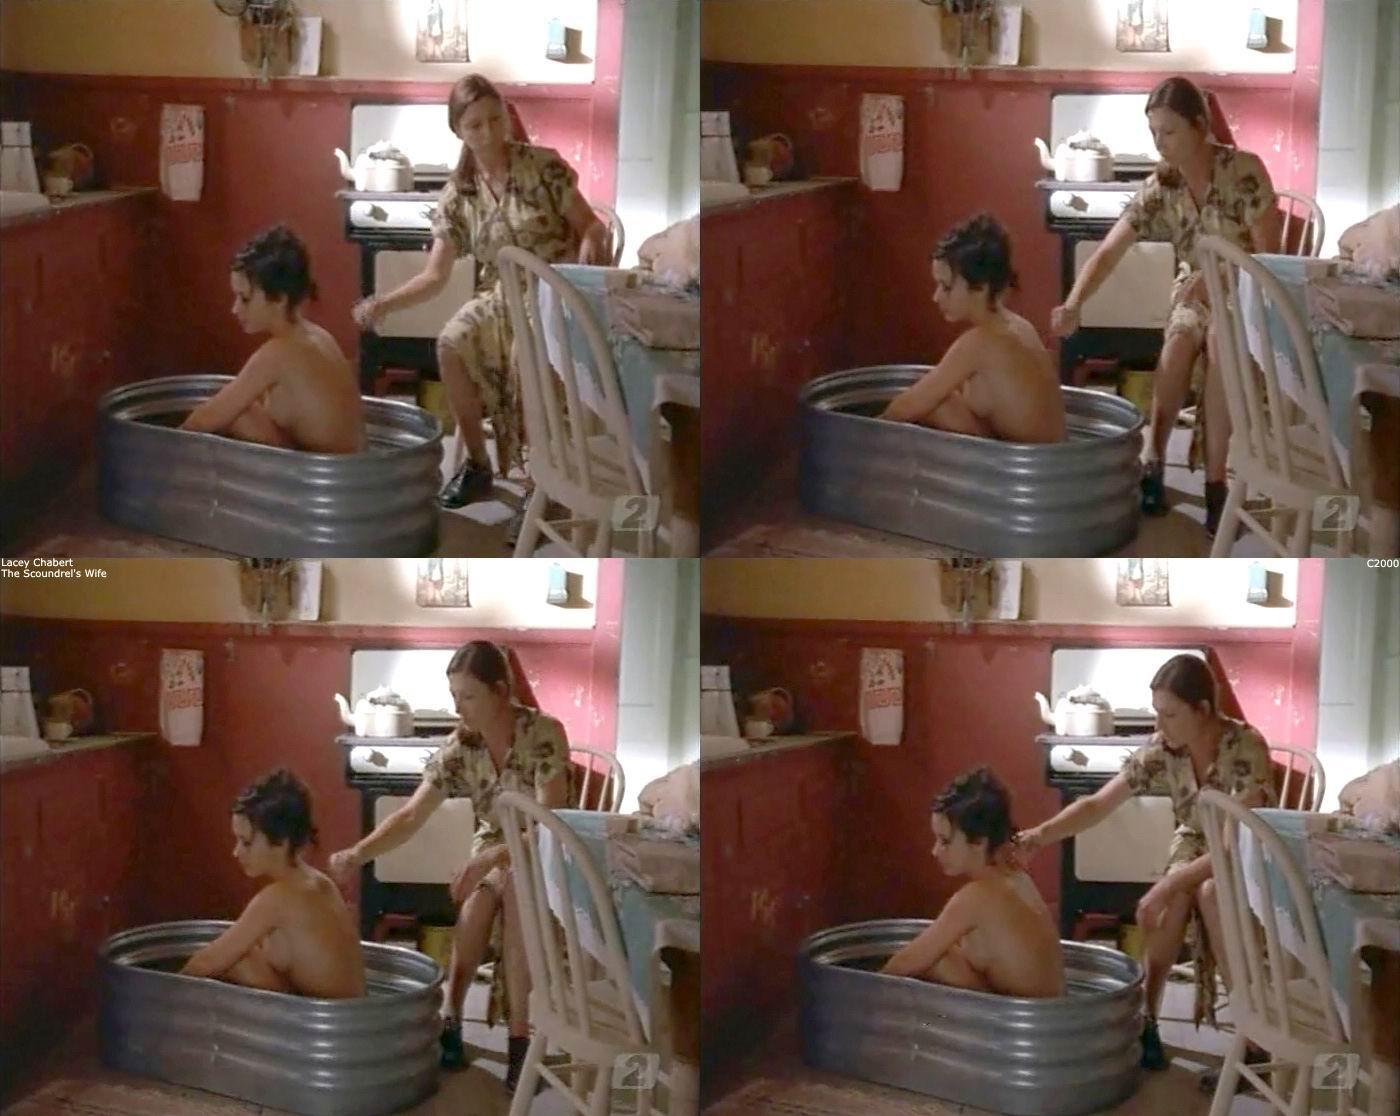 fotos de Lacey Chabert desnuda